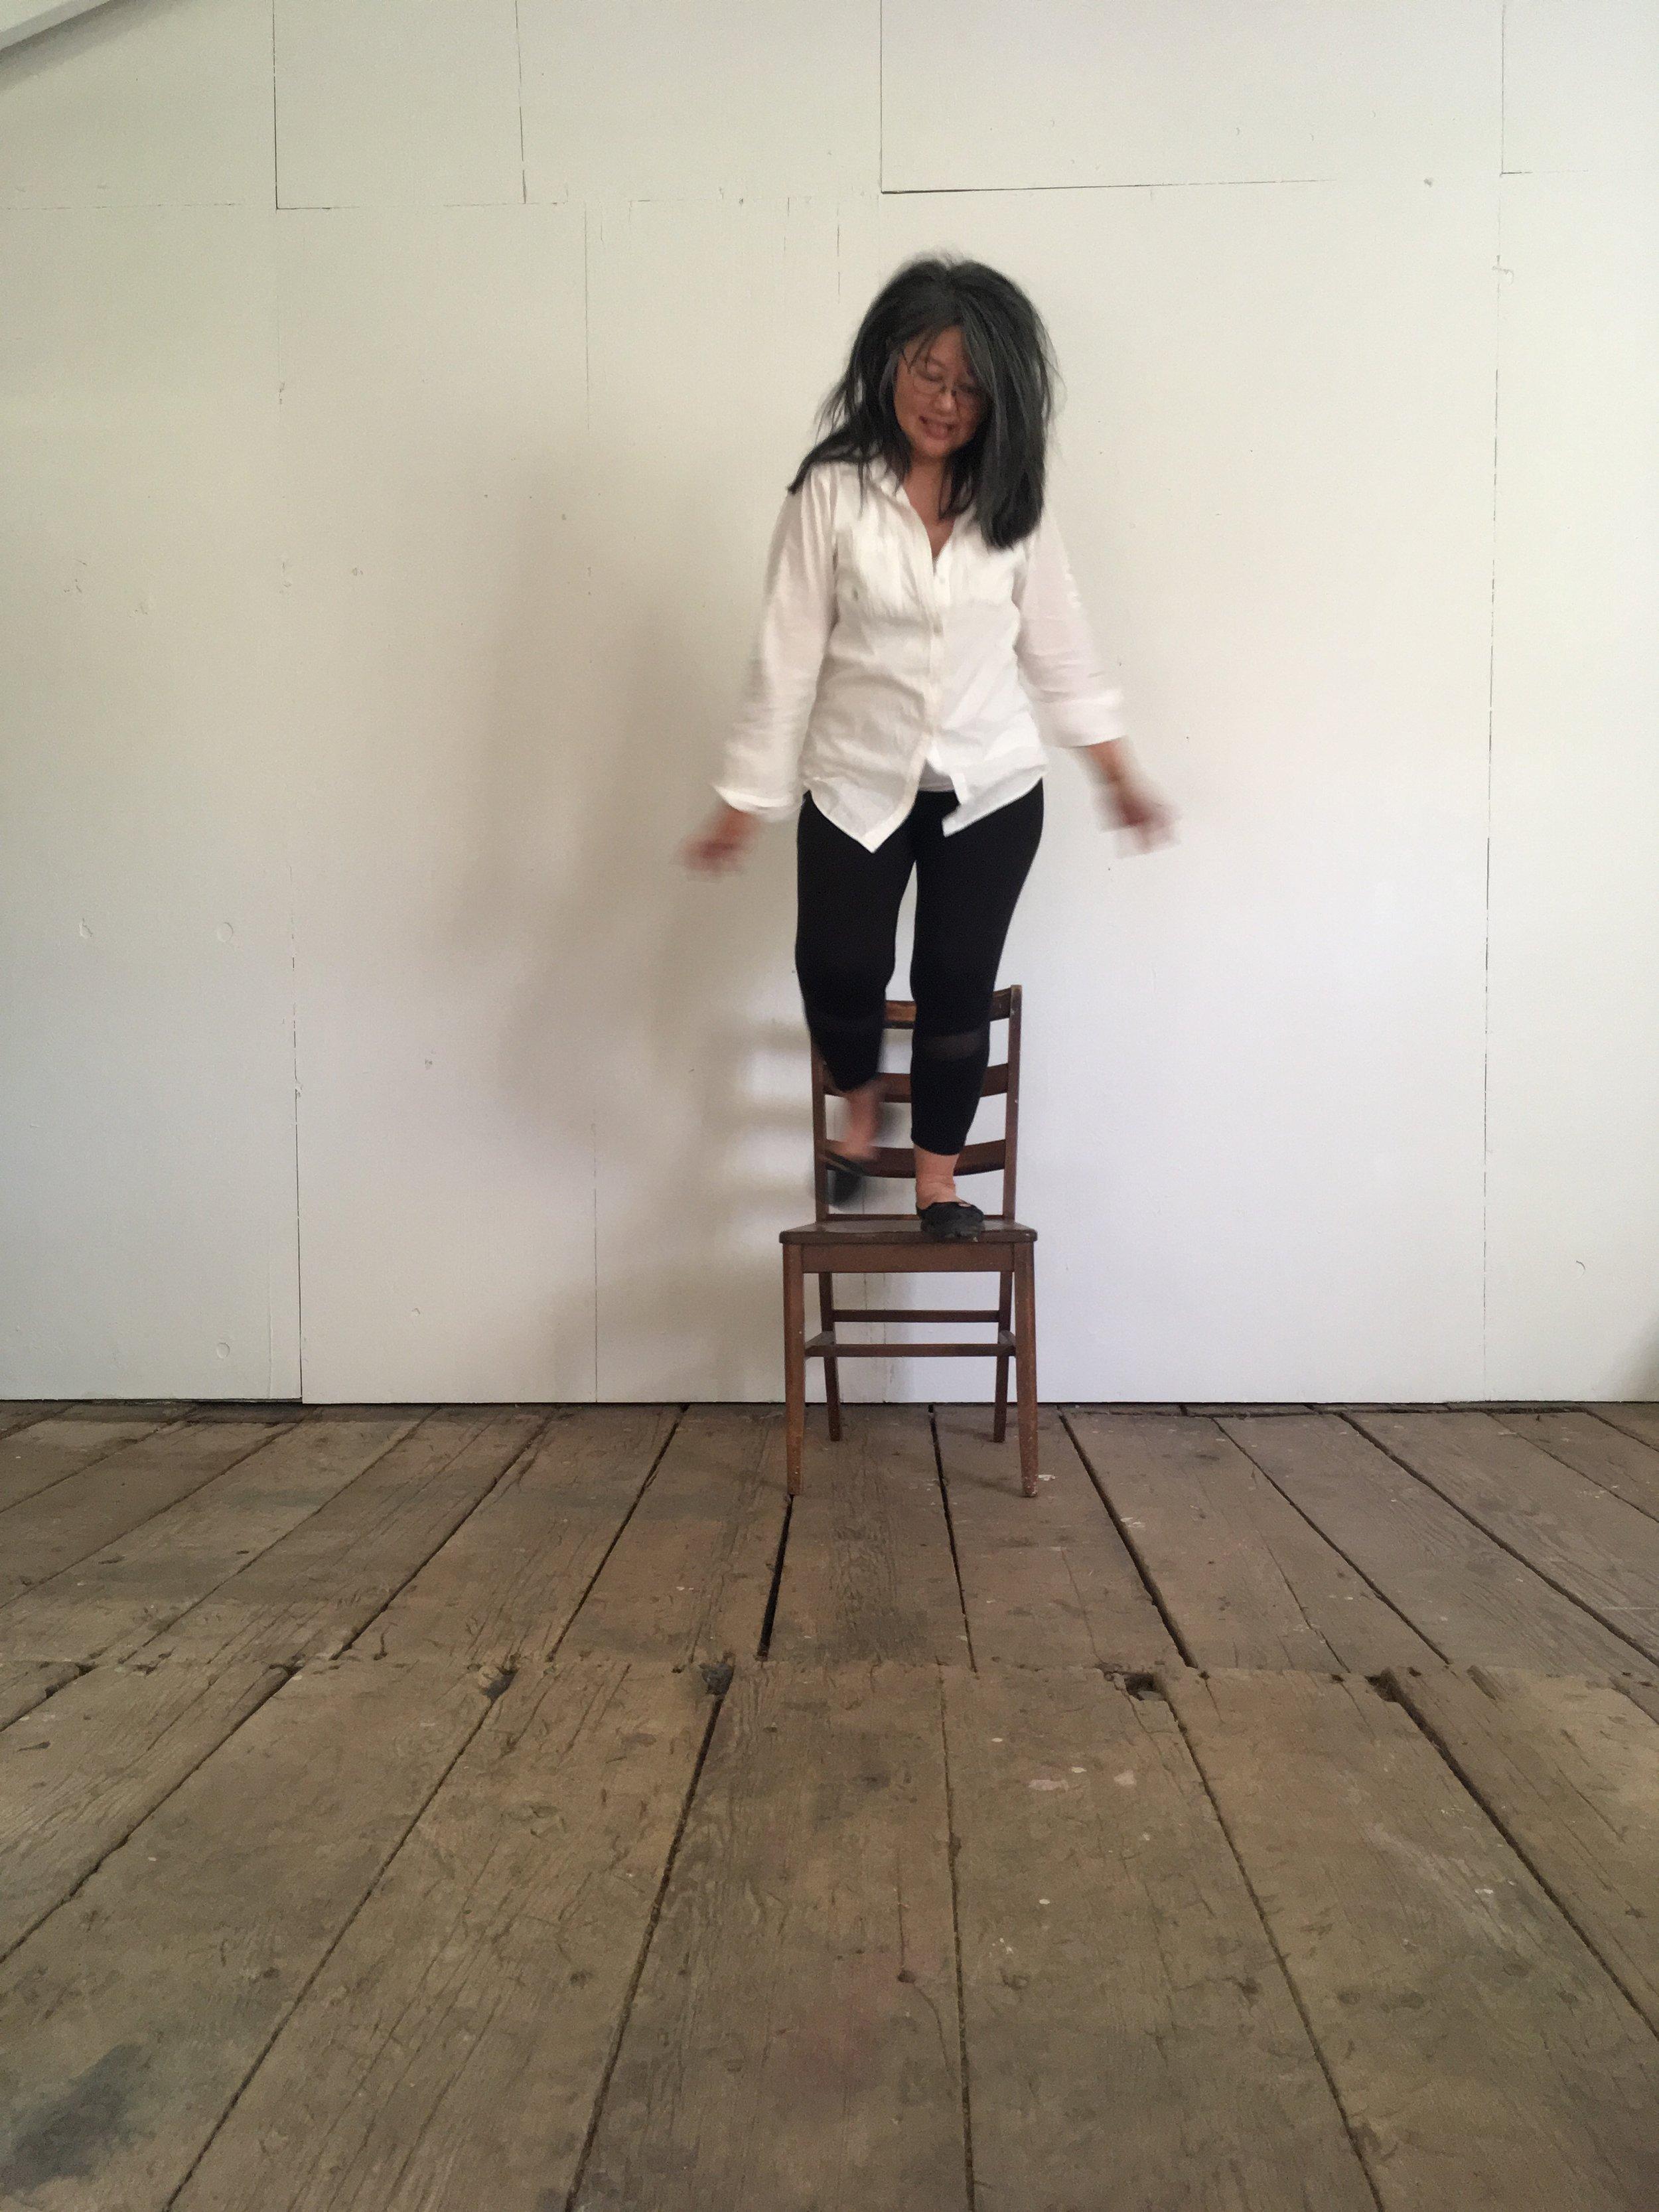 PHOTO chalk hill - studio - jumping 3.JPG